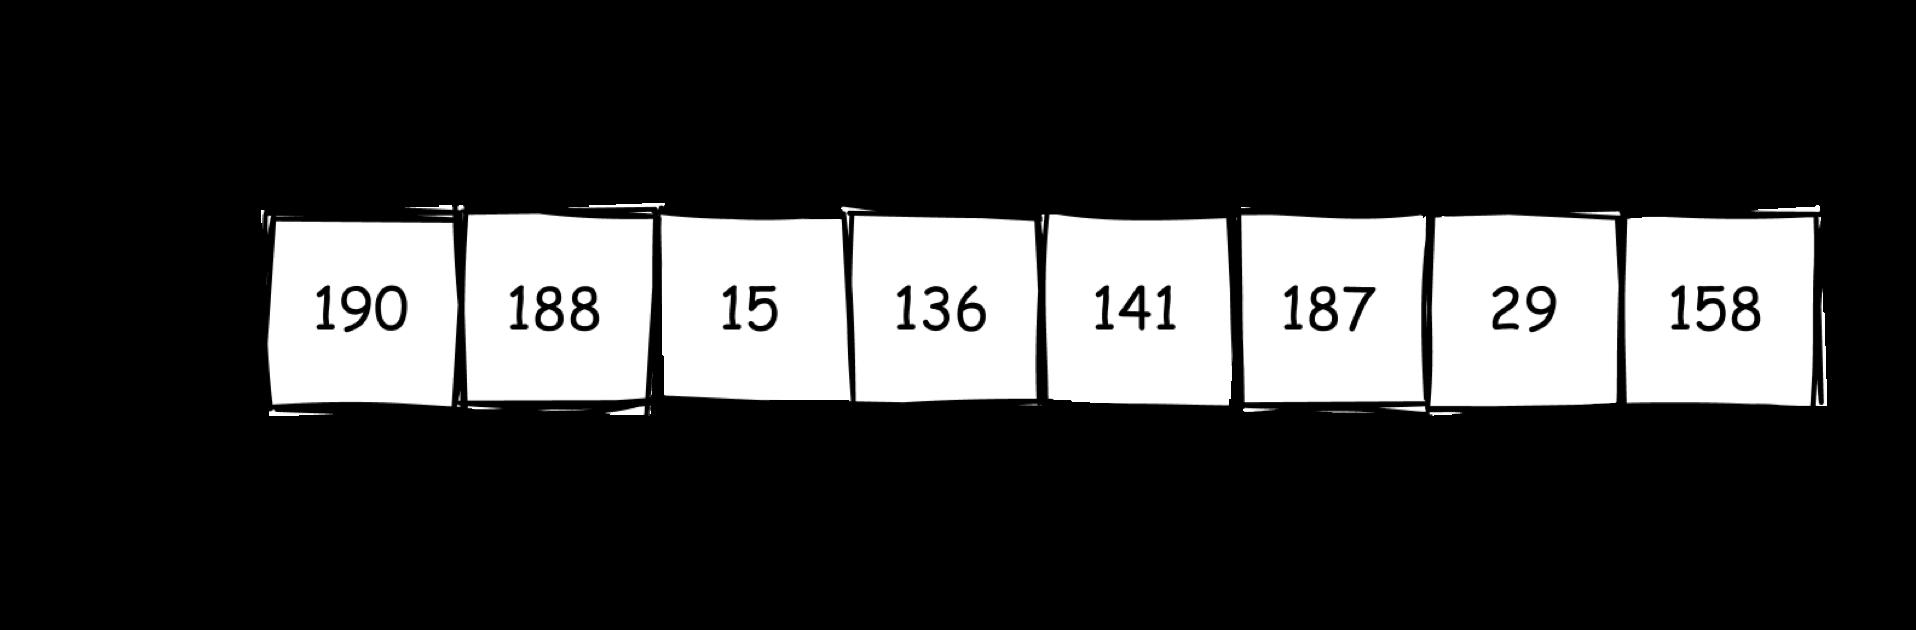 1 слово = 8 байт (на 64 битных процессорах)